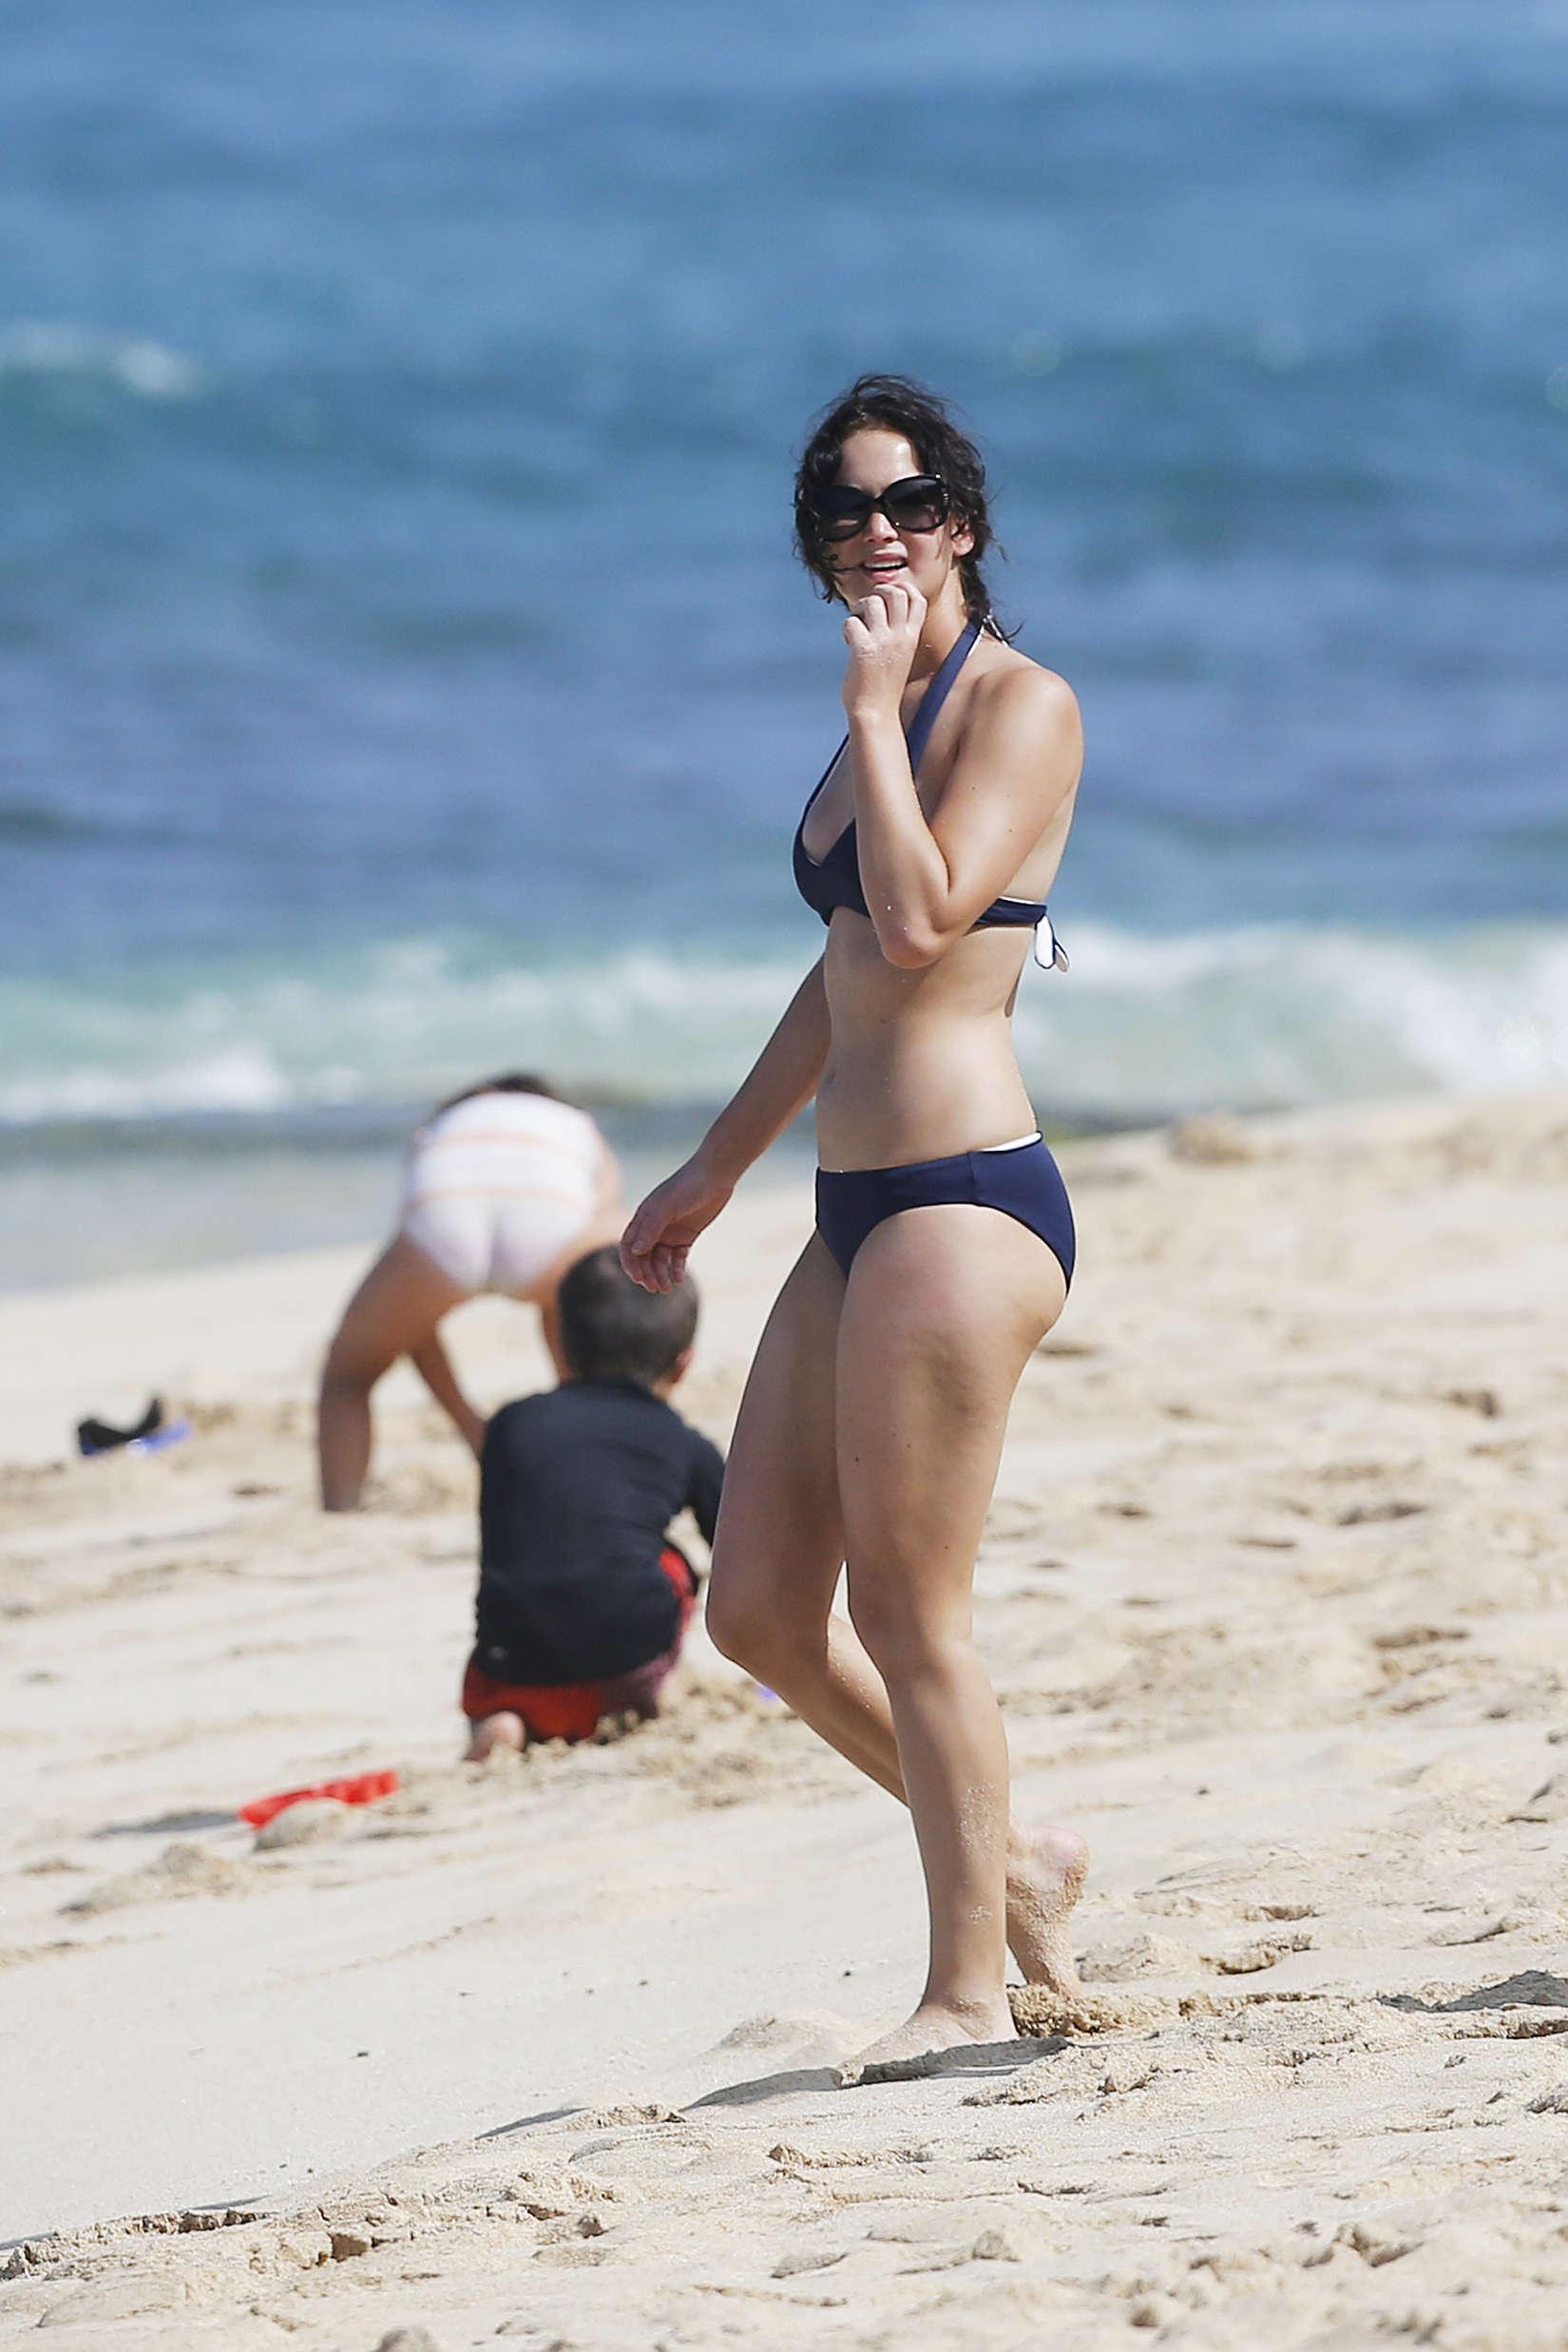 Bikini Jennifer Lawrence nudes (81 photos), Pussy, Hot, Twitter, braless 2006